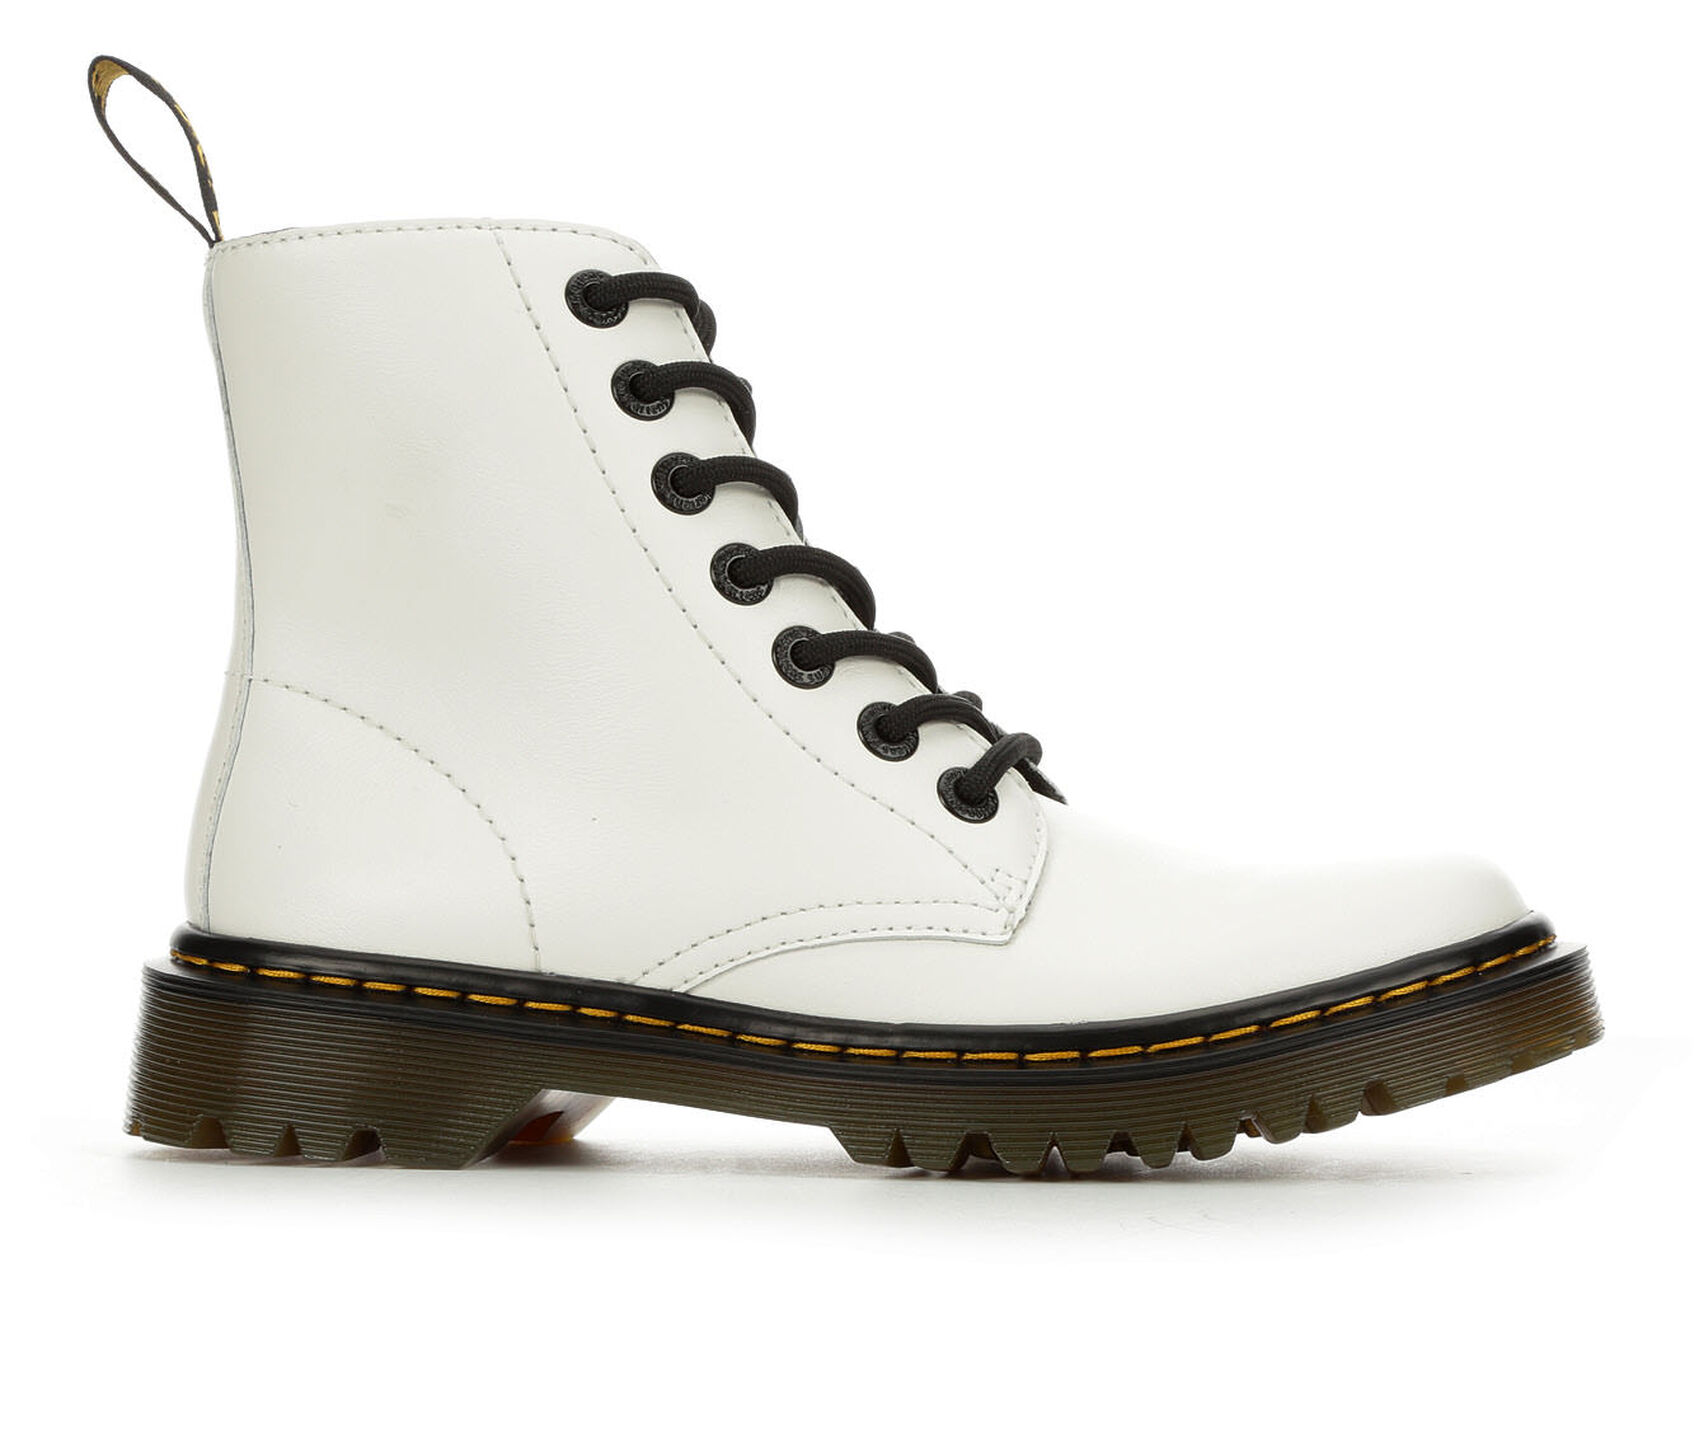 764cf1d0b5 Women's Dr. Martens Luana 6 Eye Combat Boots | Shoe Carnival